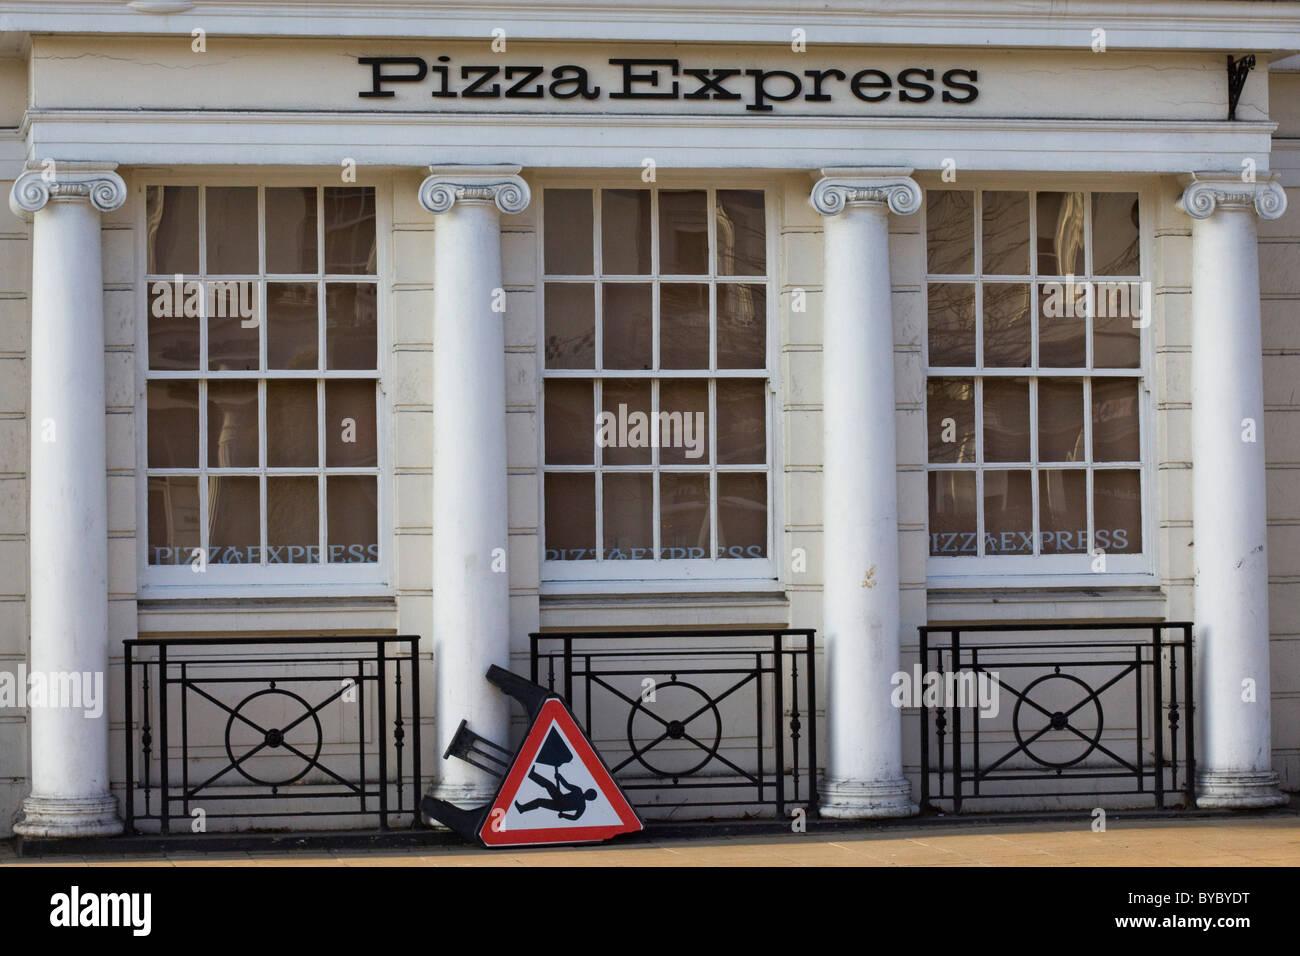 Pizza Express Royal Leamington Spa England Stock Photo